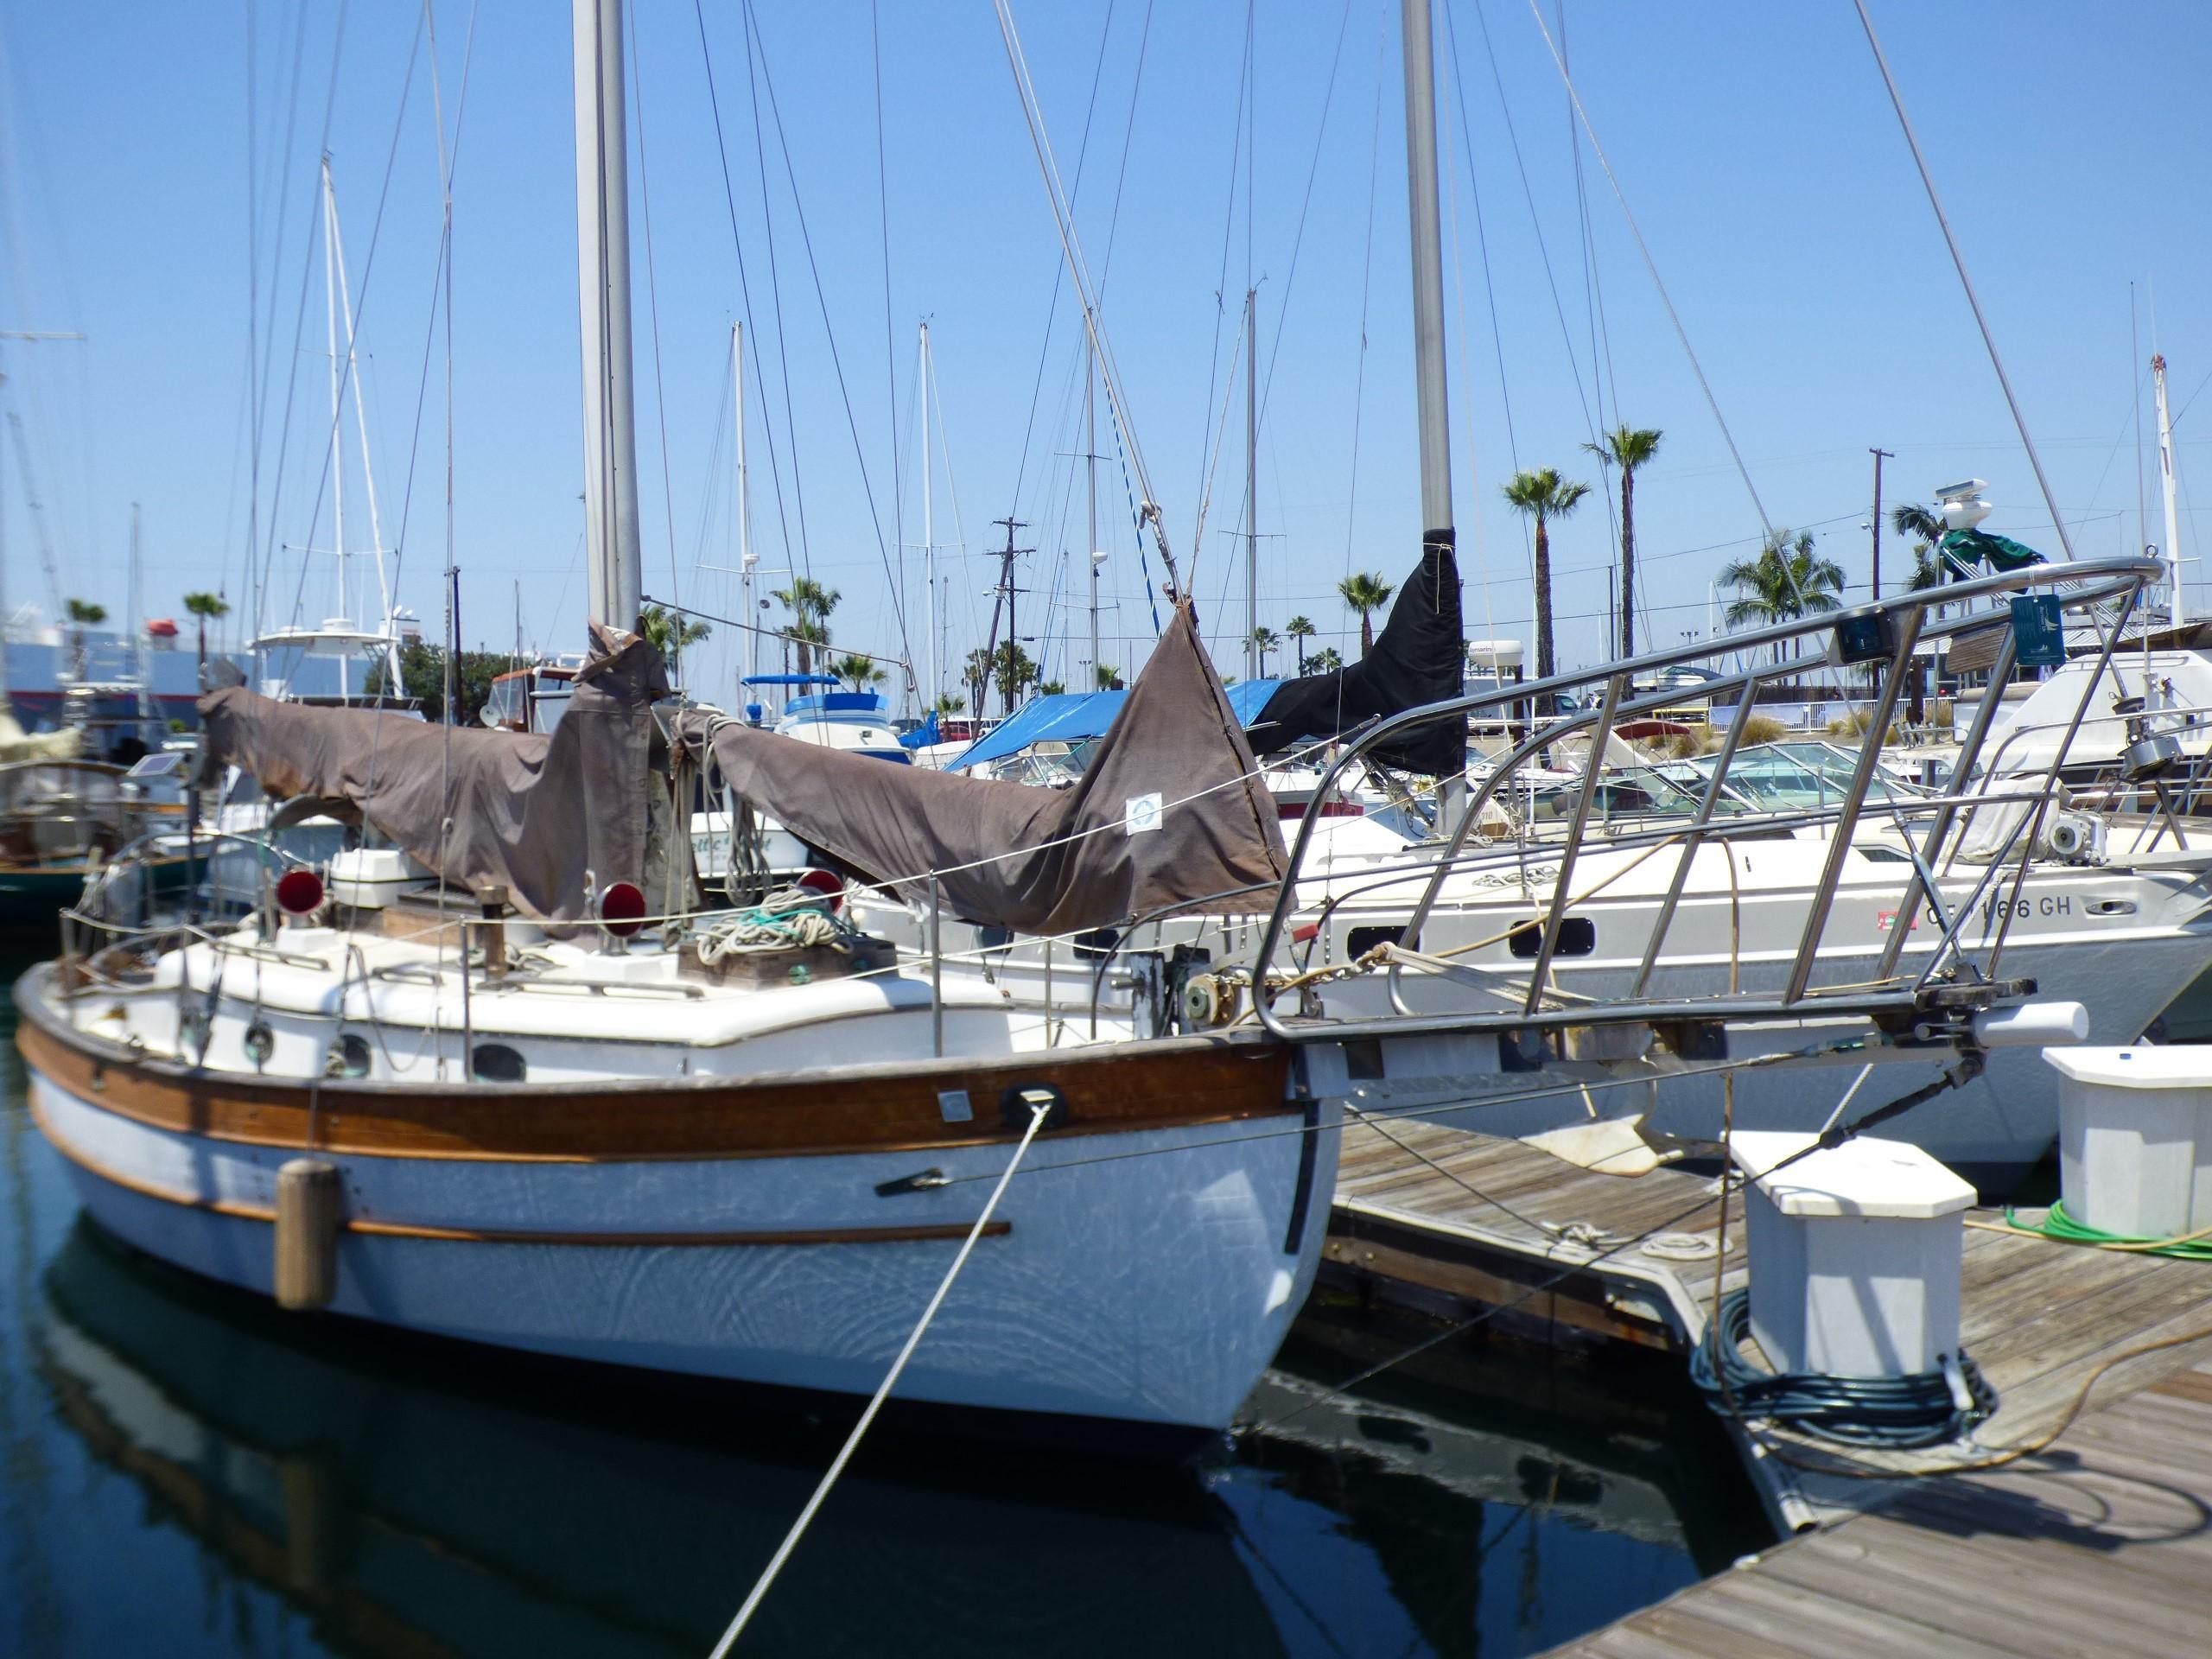 1978 Hans Christian 34 Cutter Sail Boat For Sale Wwwyachtworldcom